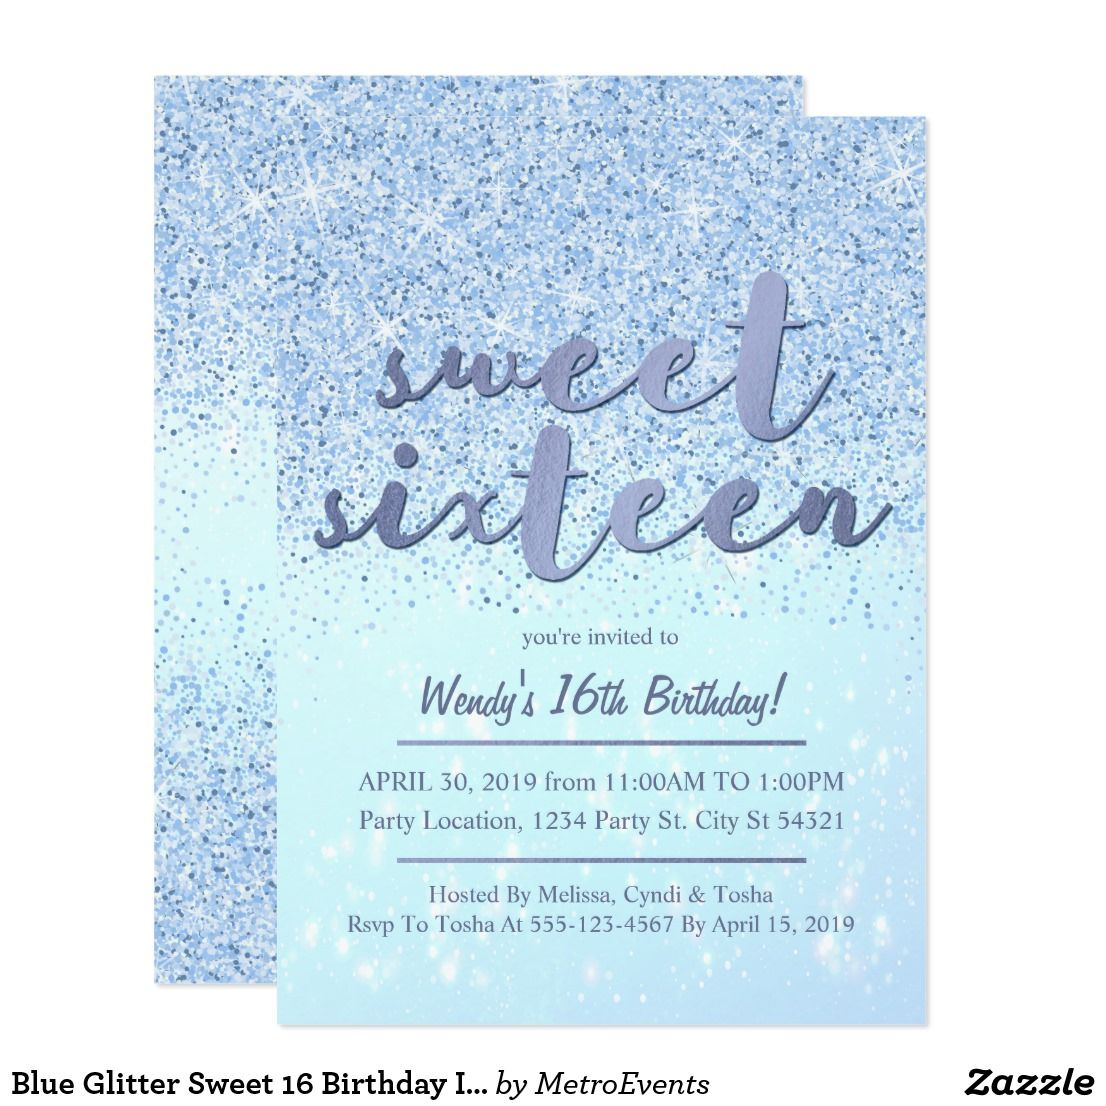 Blue Glitter Sweet 16 Birthday Invitations | Sweet 16 birthday ...